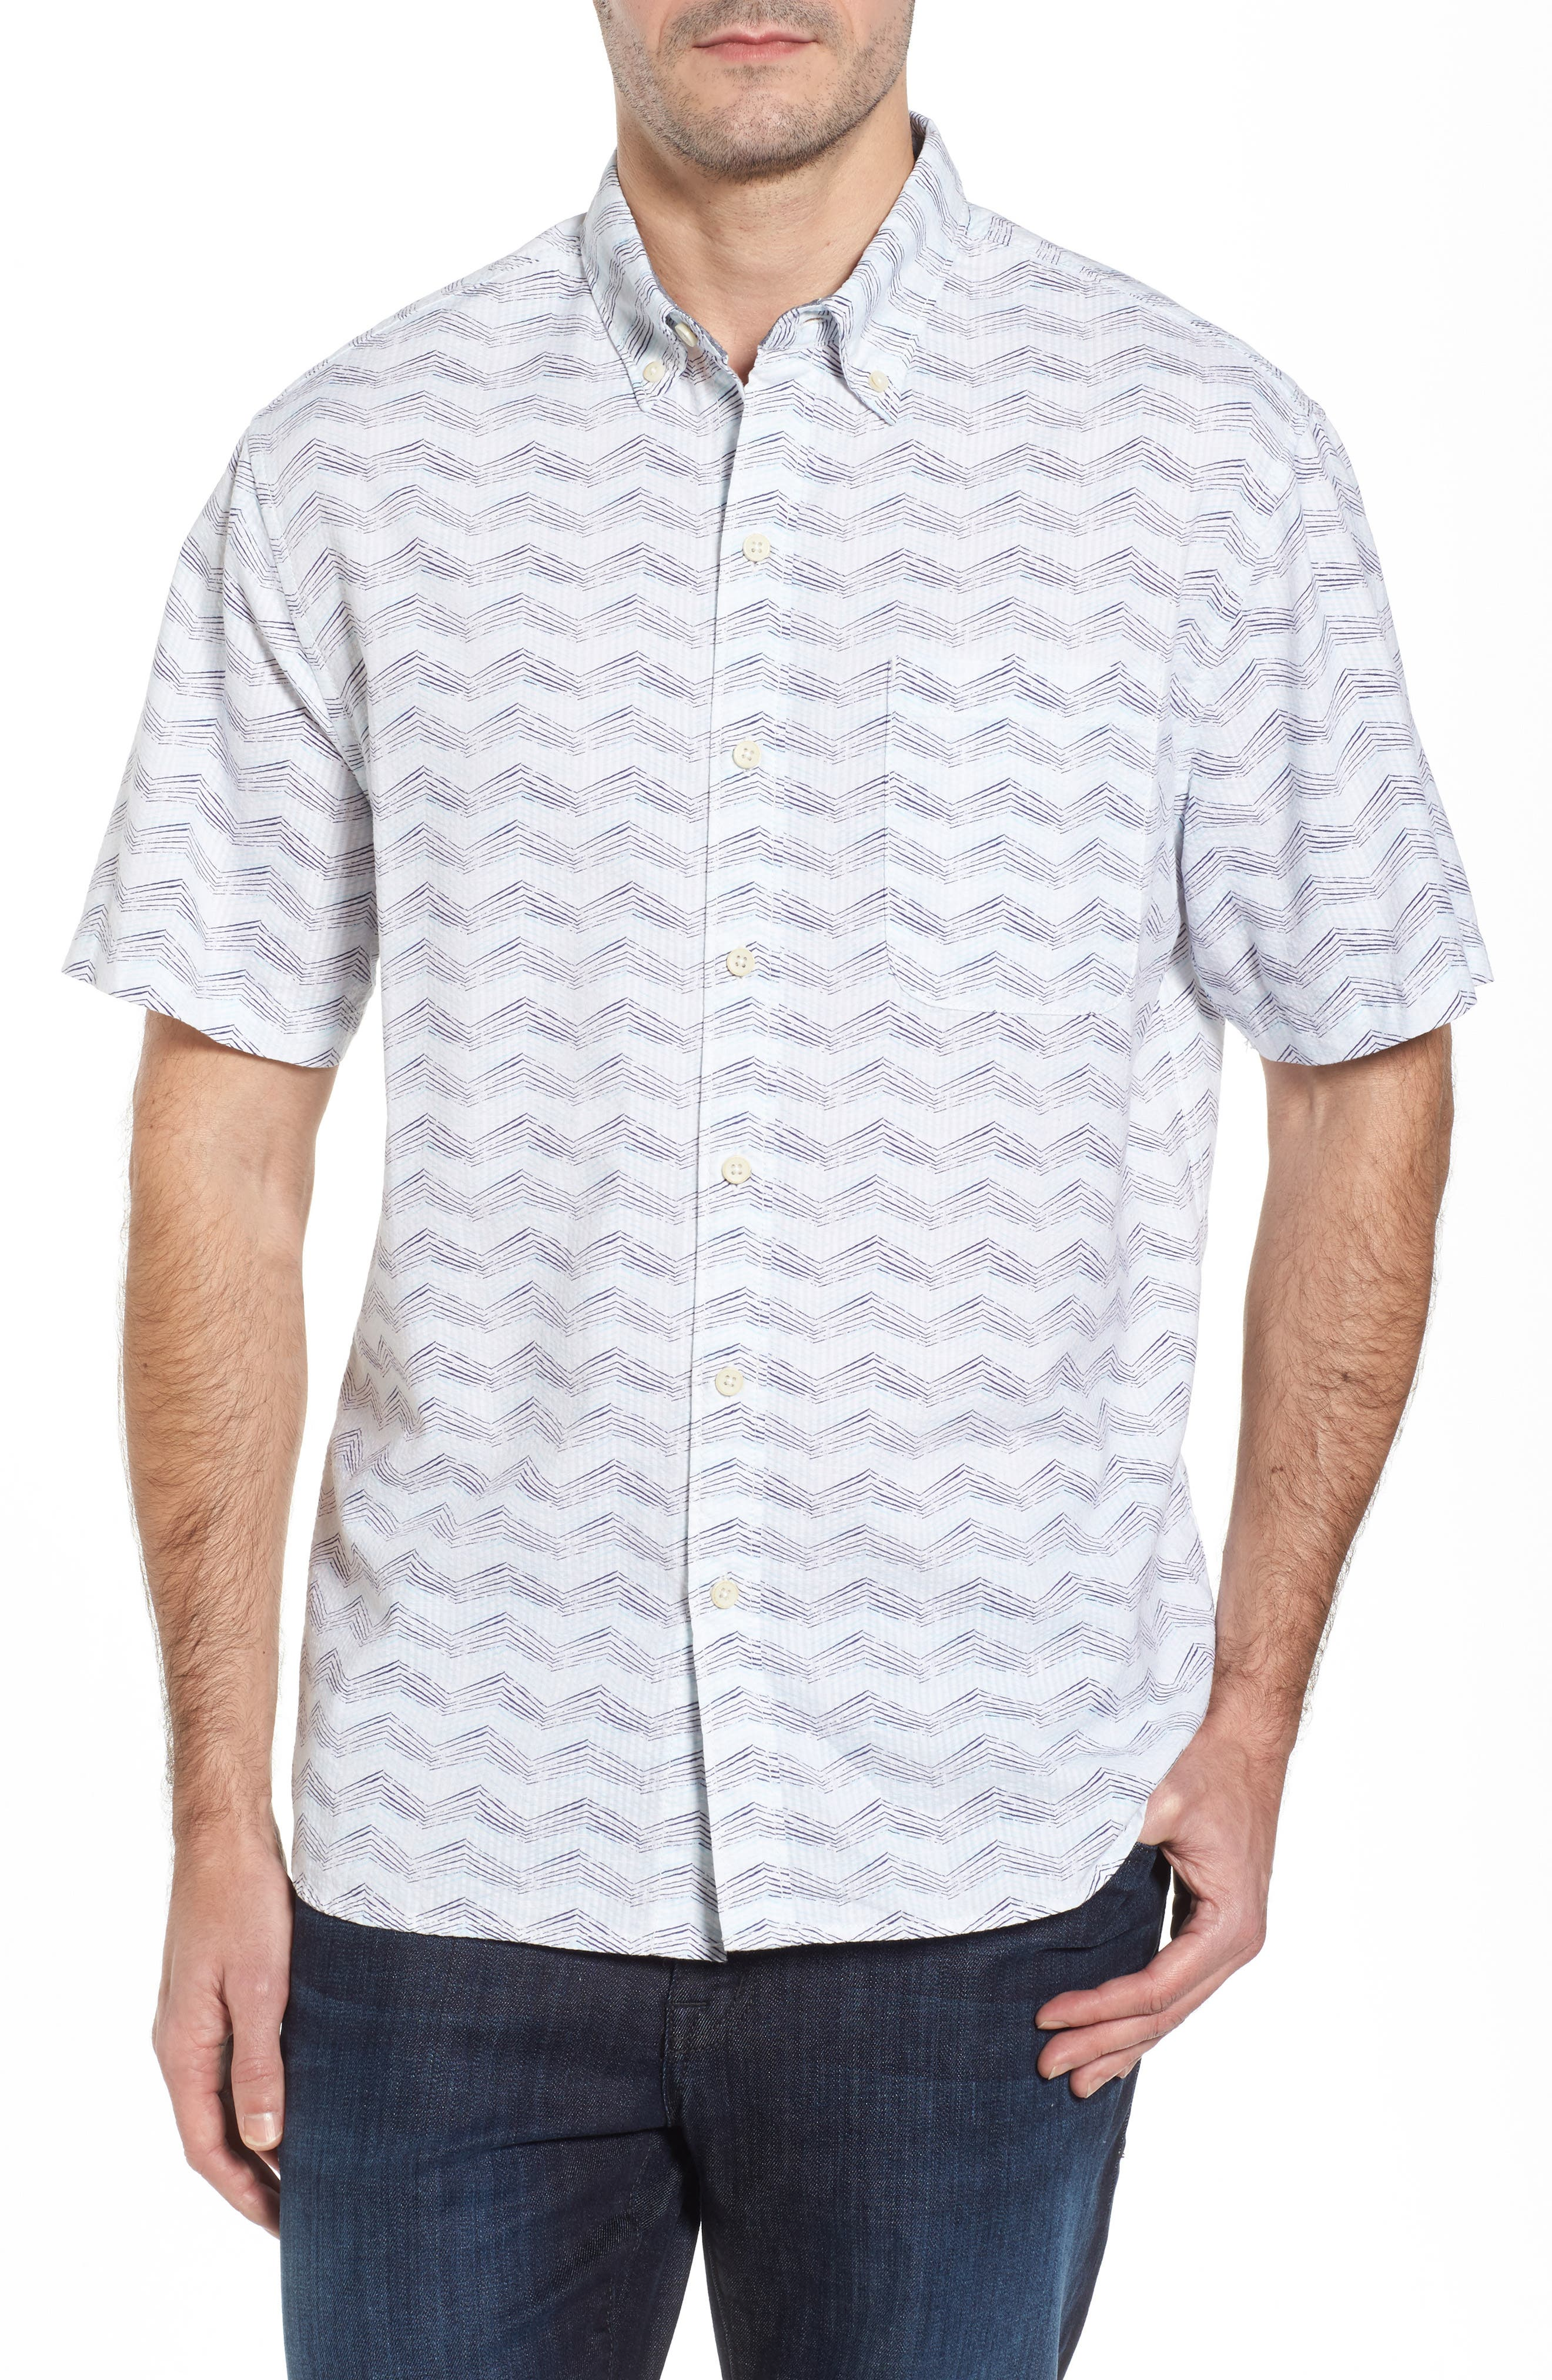 Alternate Image 1 Selected - Tommy Bahama Chevron Shores Print Sport Shirt